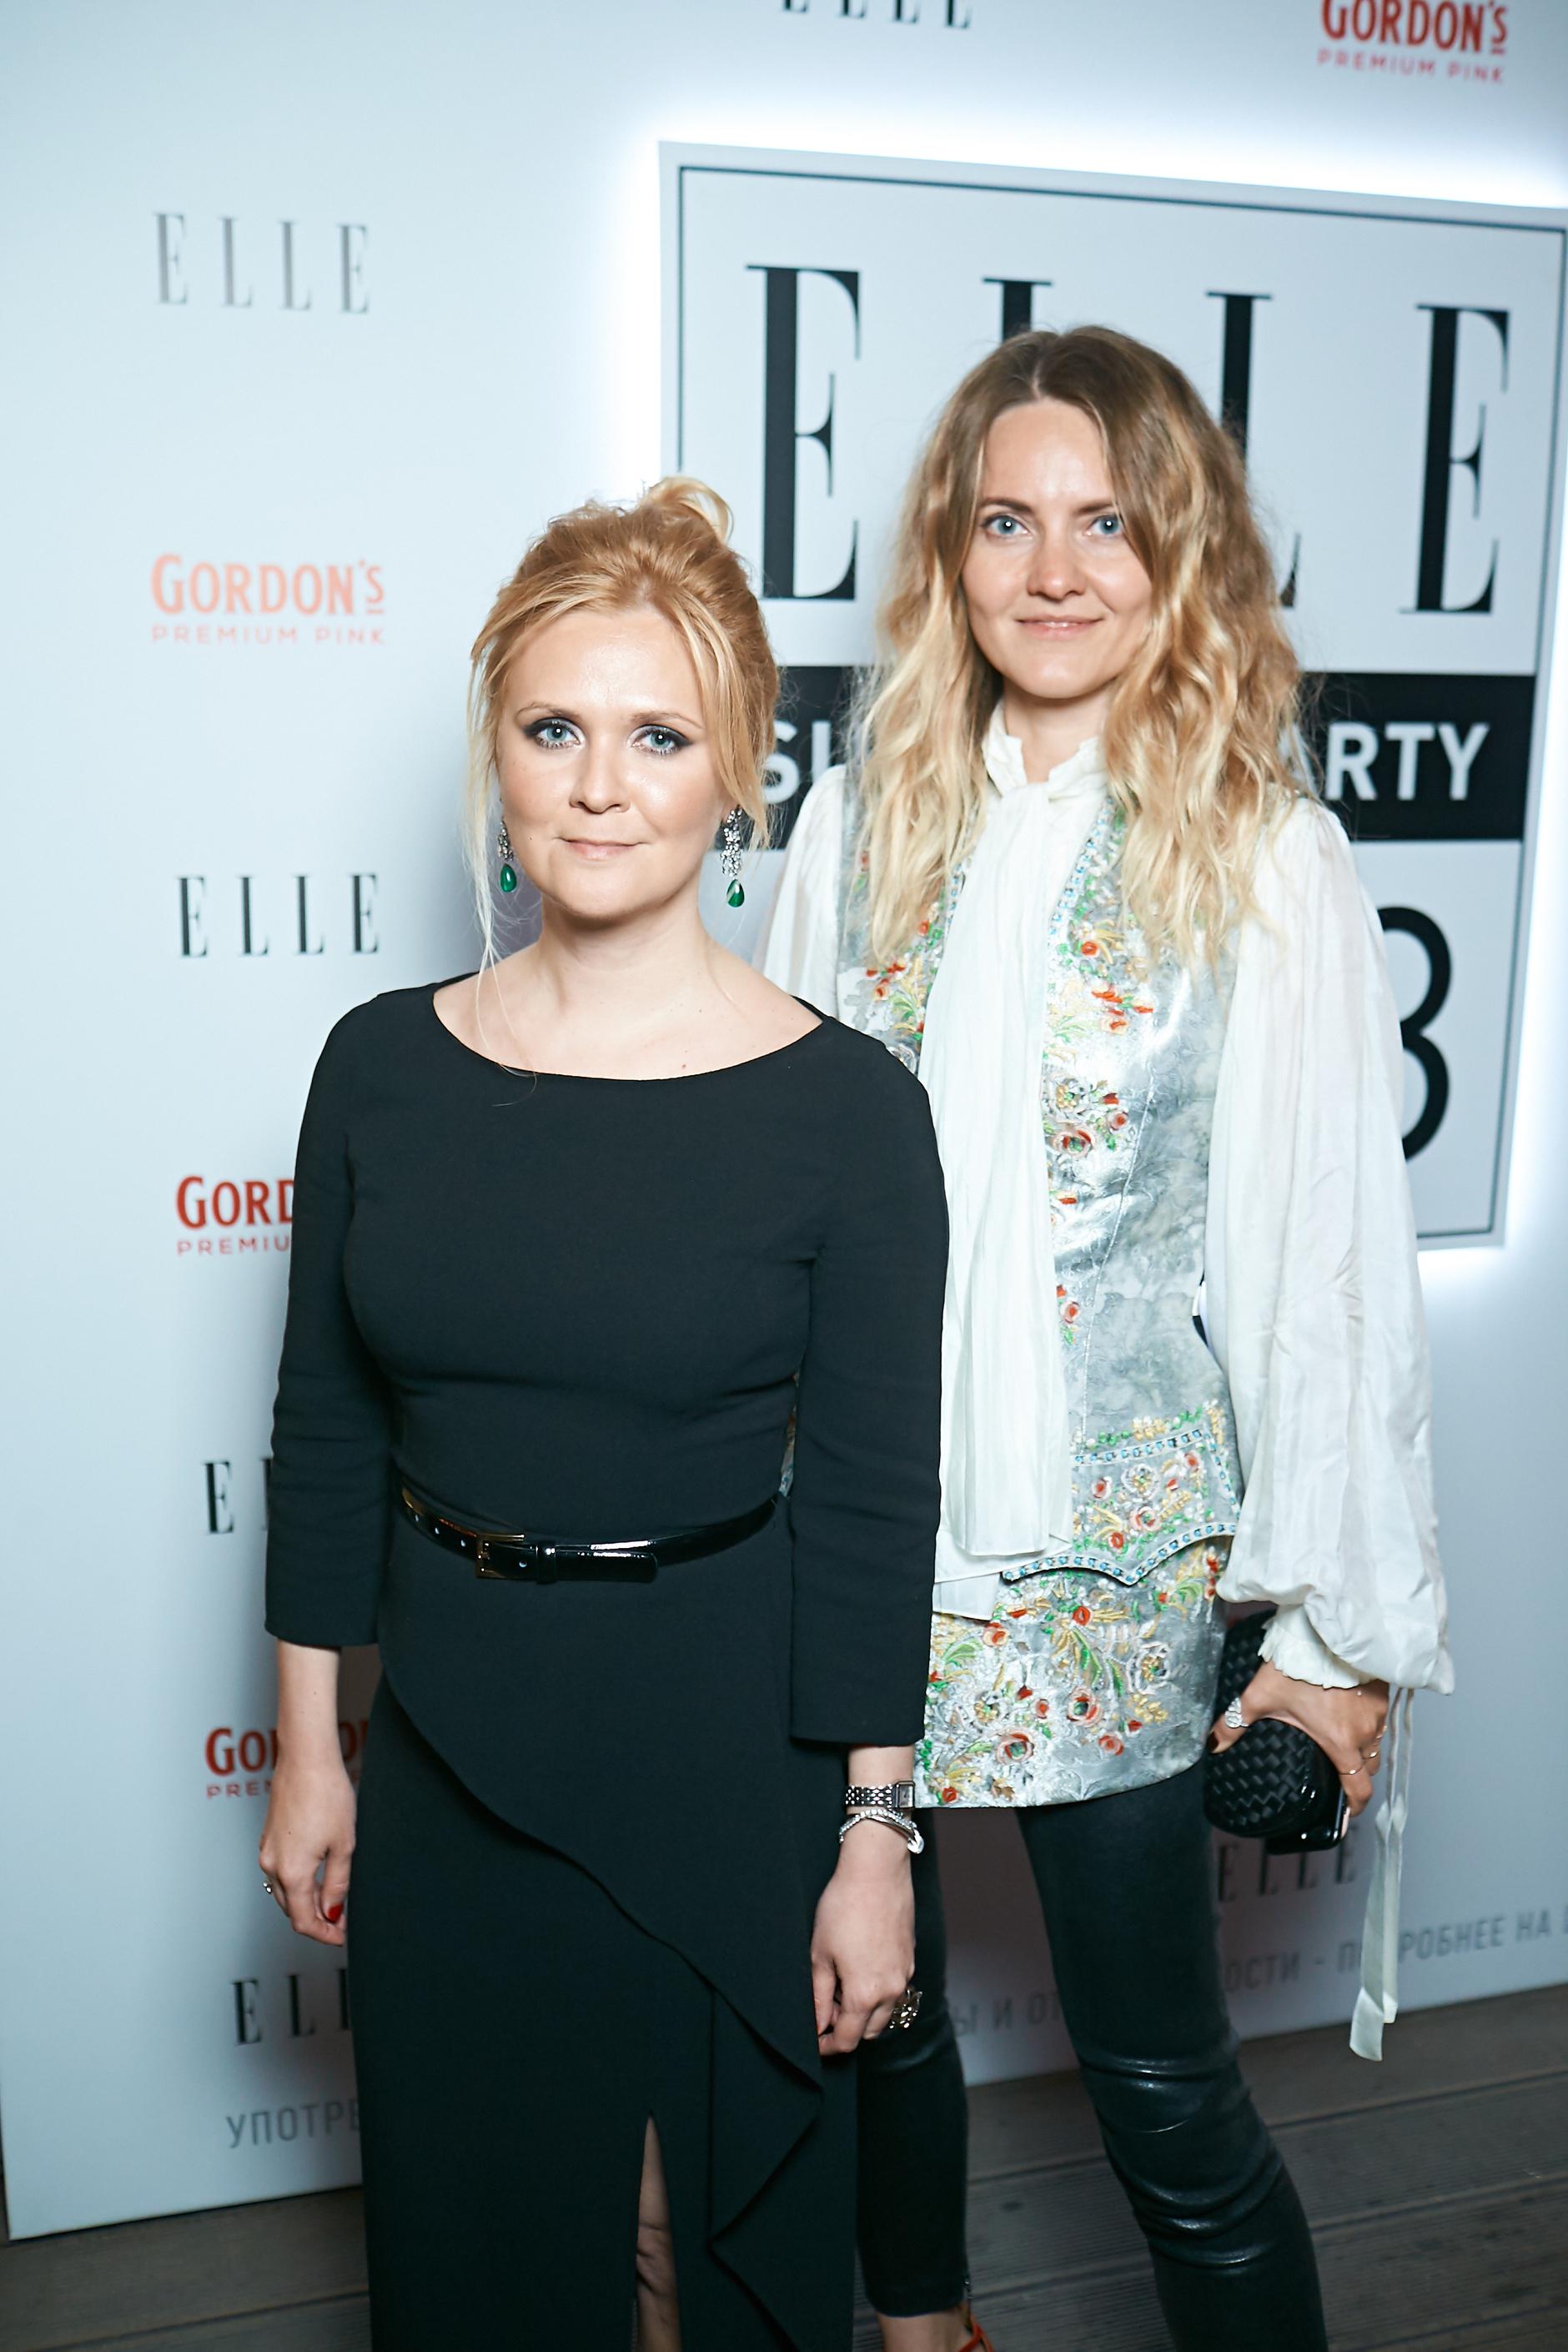 Elle Summer Party (галерея 1, фото 18)